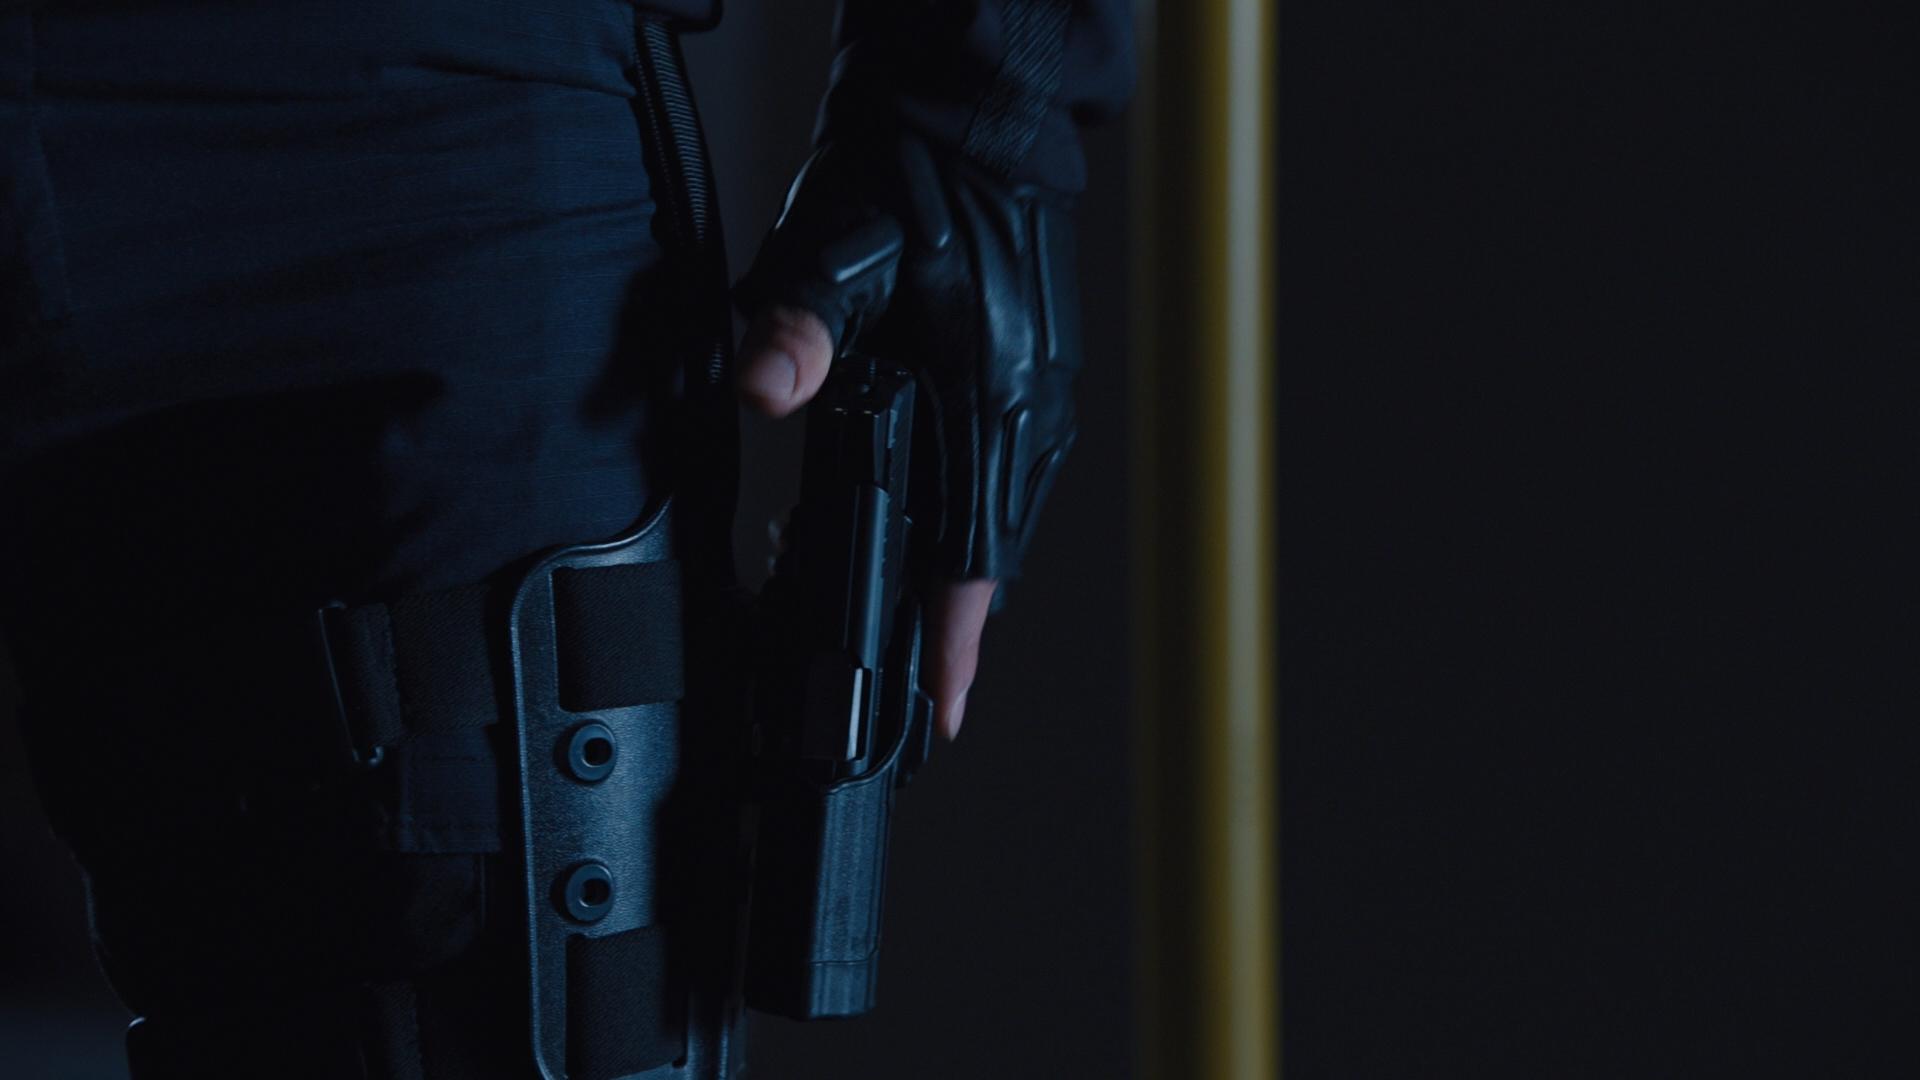 THE AVENGERS (2012) - Hawkeye's (Jeremy Renner) H&K P30 Stunt Pistol - Image 8 of 10